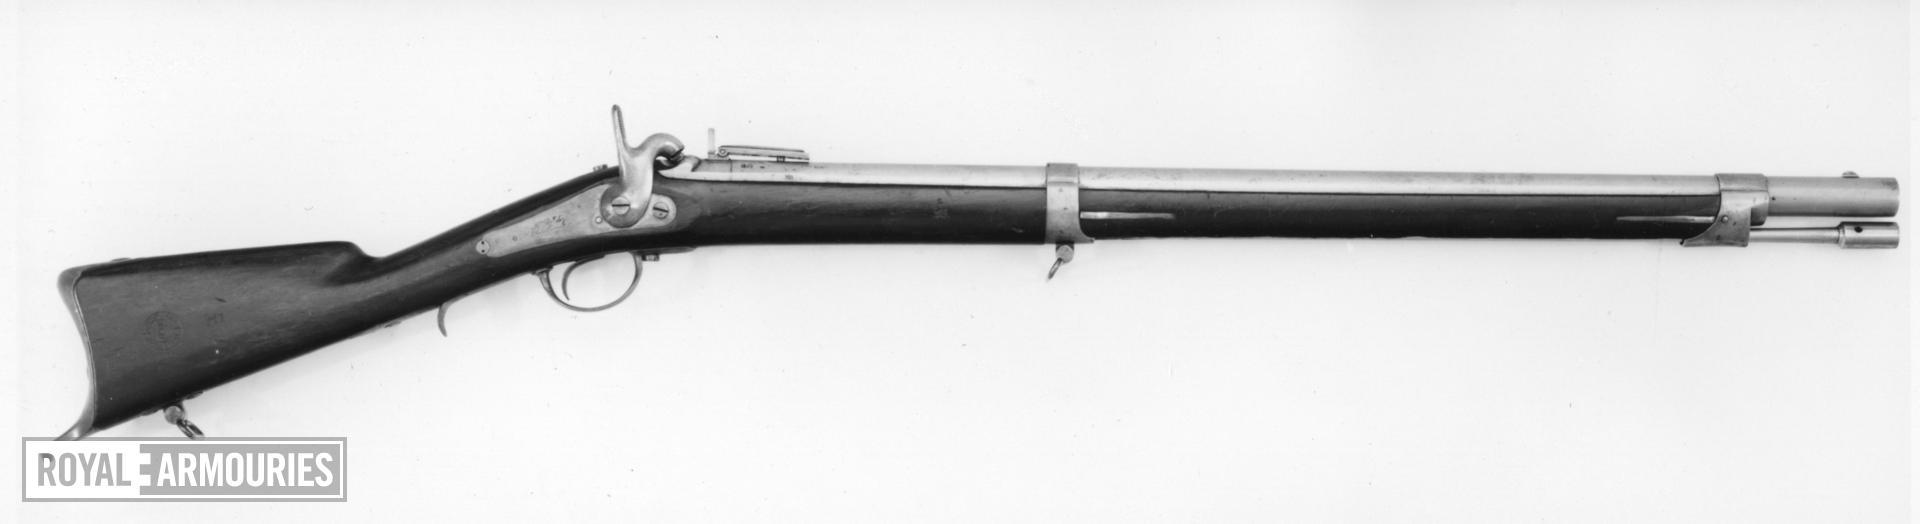 Percussion muzzle-loading military rifle - Model 1840 Light Infantry model